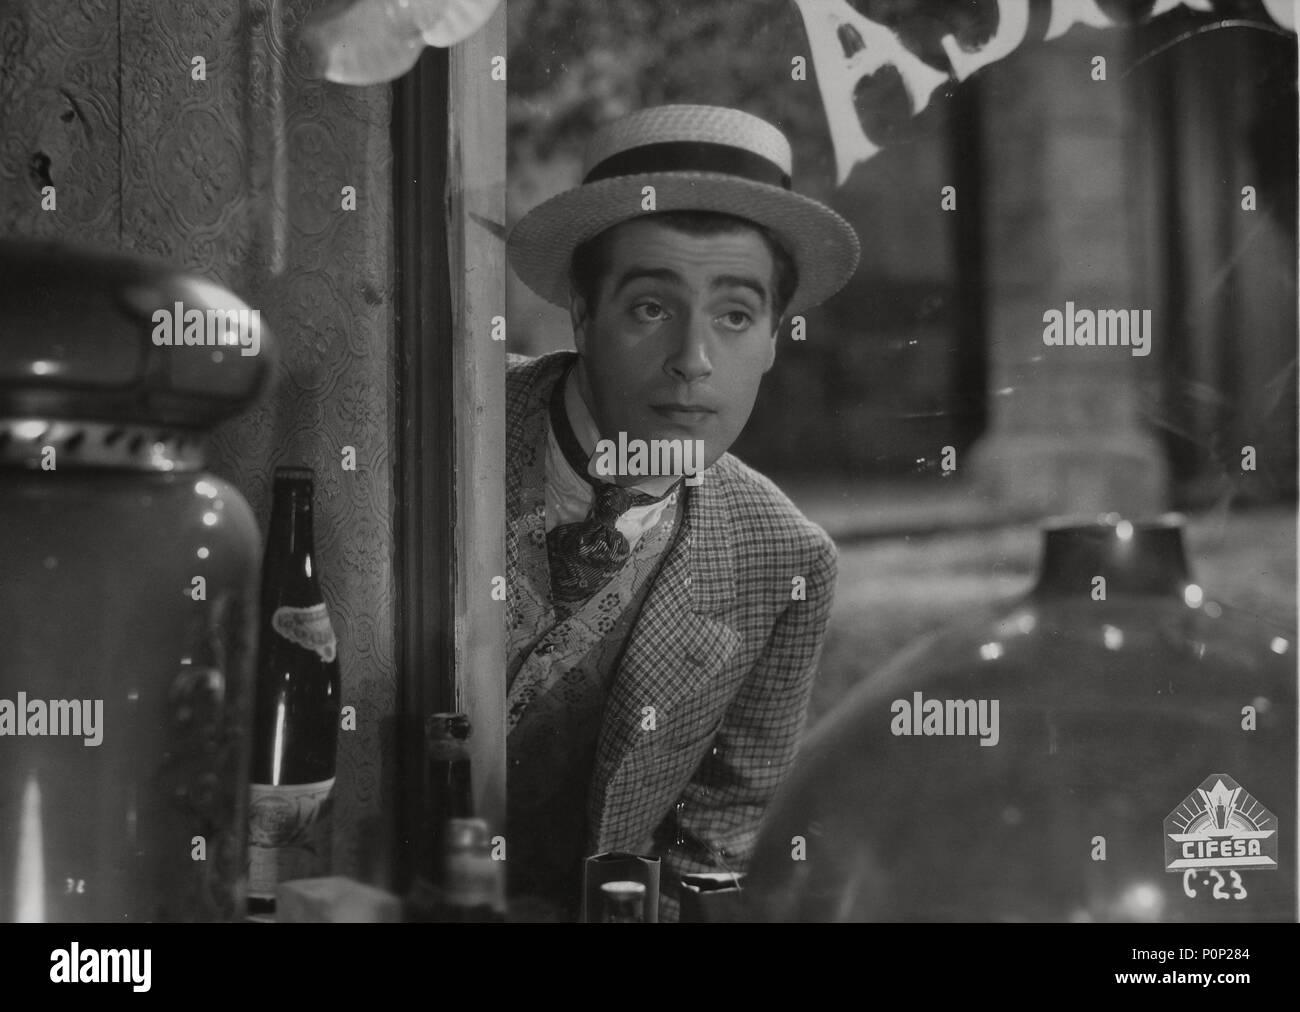 Pellicola originale titolo: EL FANTASMA Y DOÑA JUANITA. Titolo inglese: EL FANTASMA Y DOÑA JUANITA. Regista: RAFAEL GIL. Anno: 1945. Stelle: ANTONIO CASAL. Credito: CIFESA / Album Immagini Stock